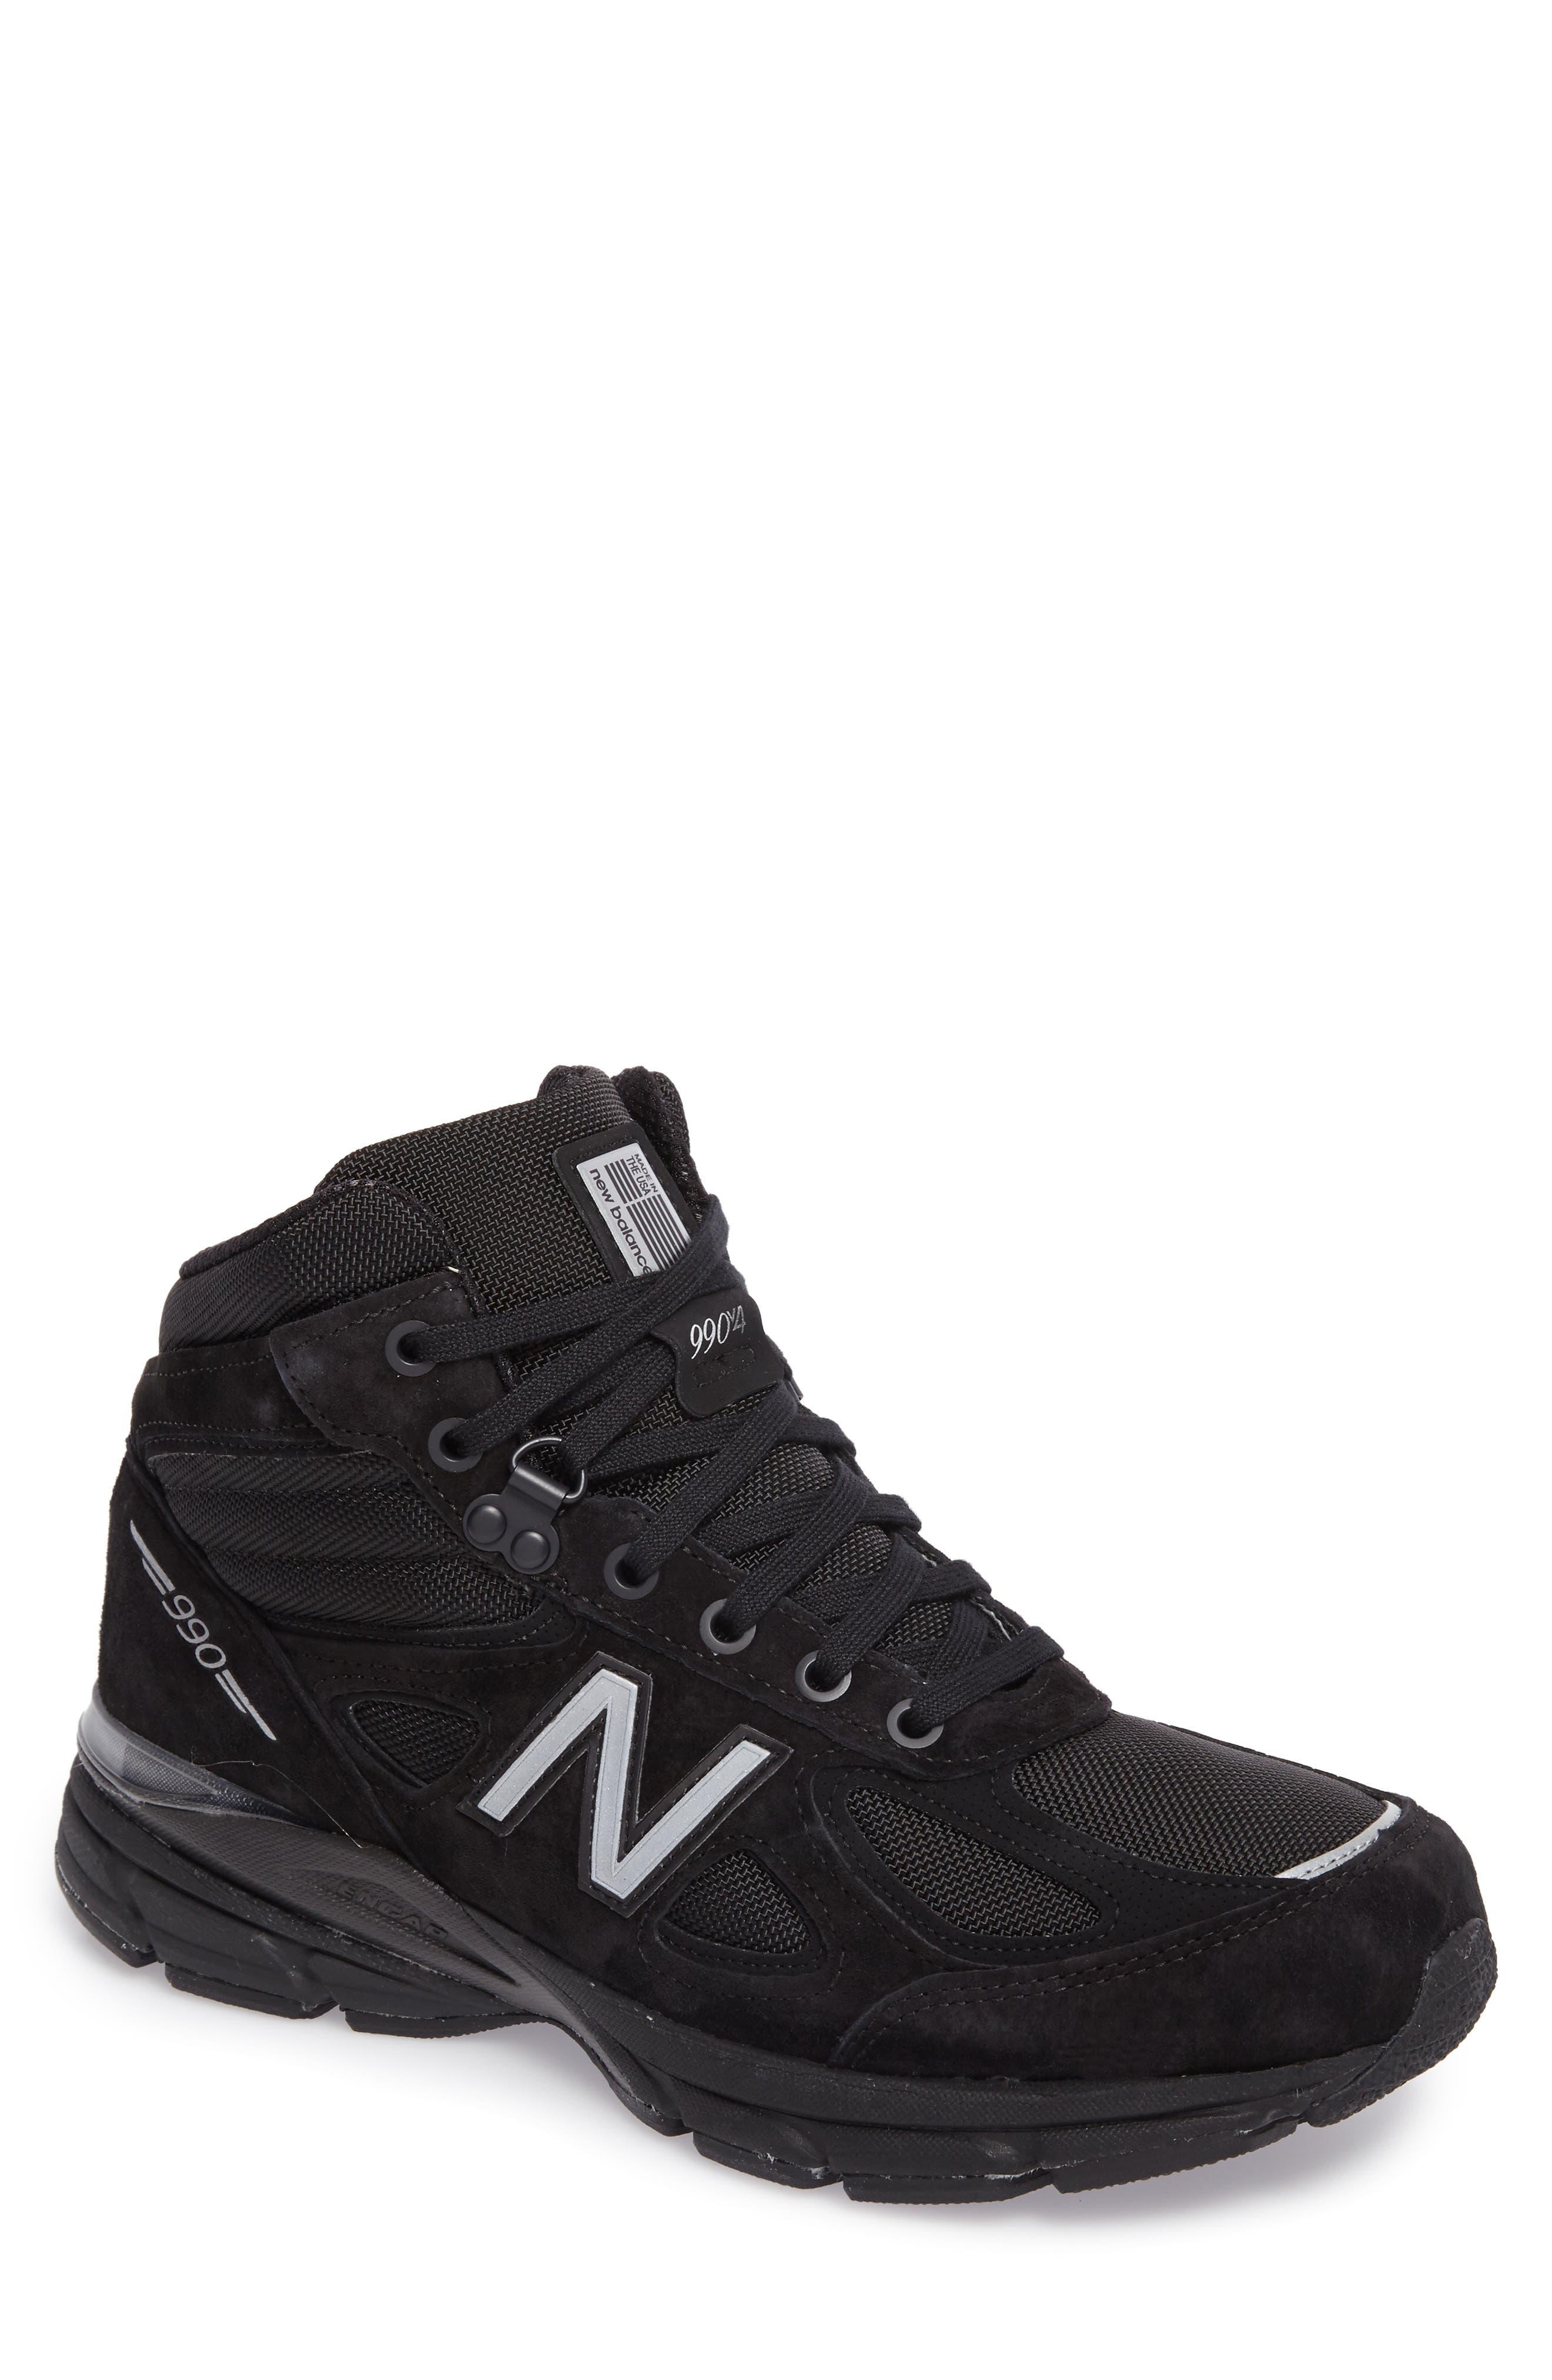 Main Image - New Balance 990v4 Water Resistant Sneaker Boot (Men)